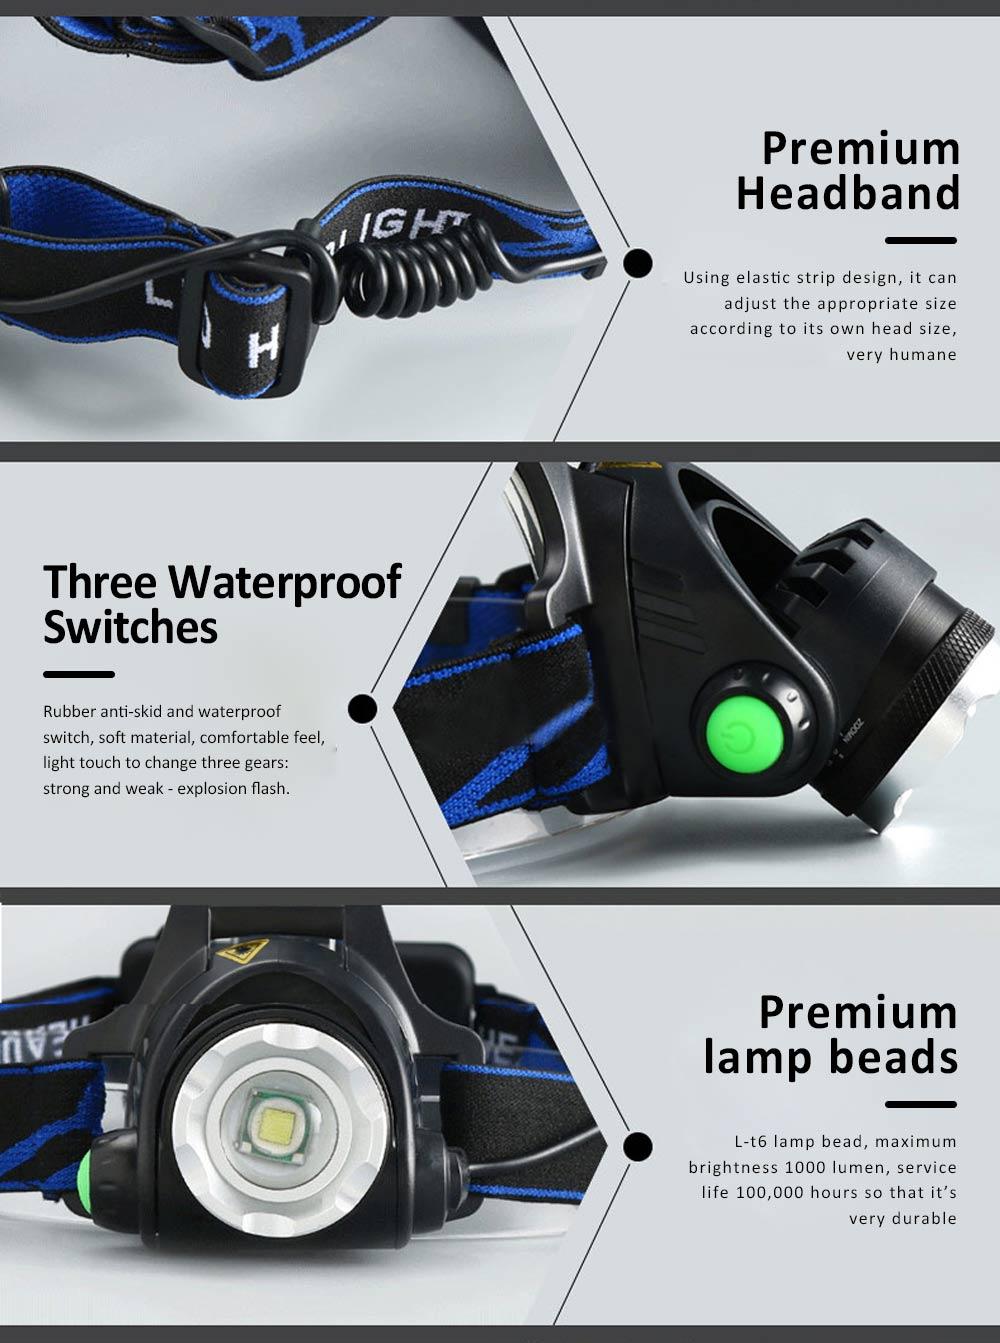 Retractable Adjustable Waterproof LED Strong Light Zoom Outdoor Fishing Bead Lamp with Elastic Light Belt 5